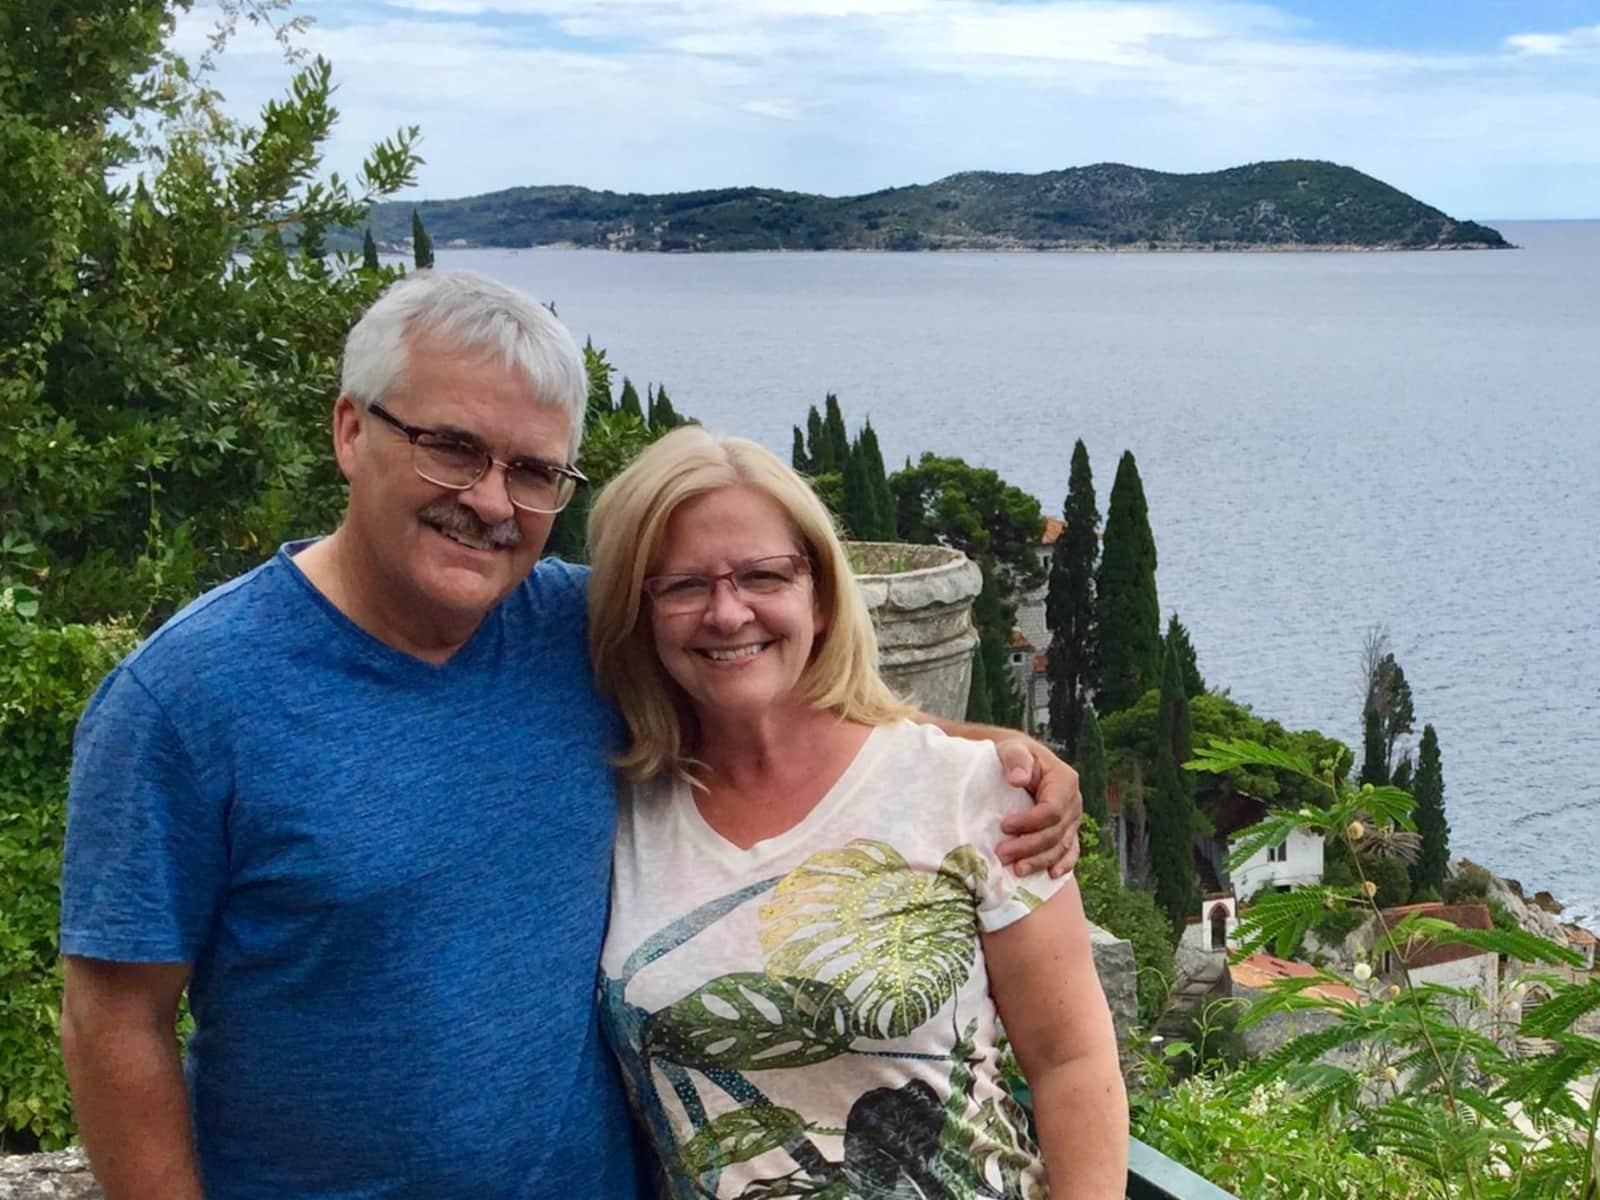 Cathy & Gary from Ottawa, Ontario, Canada